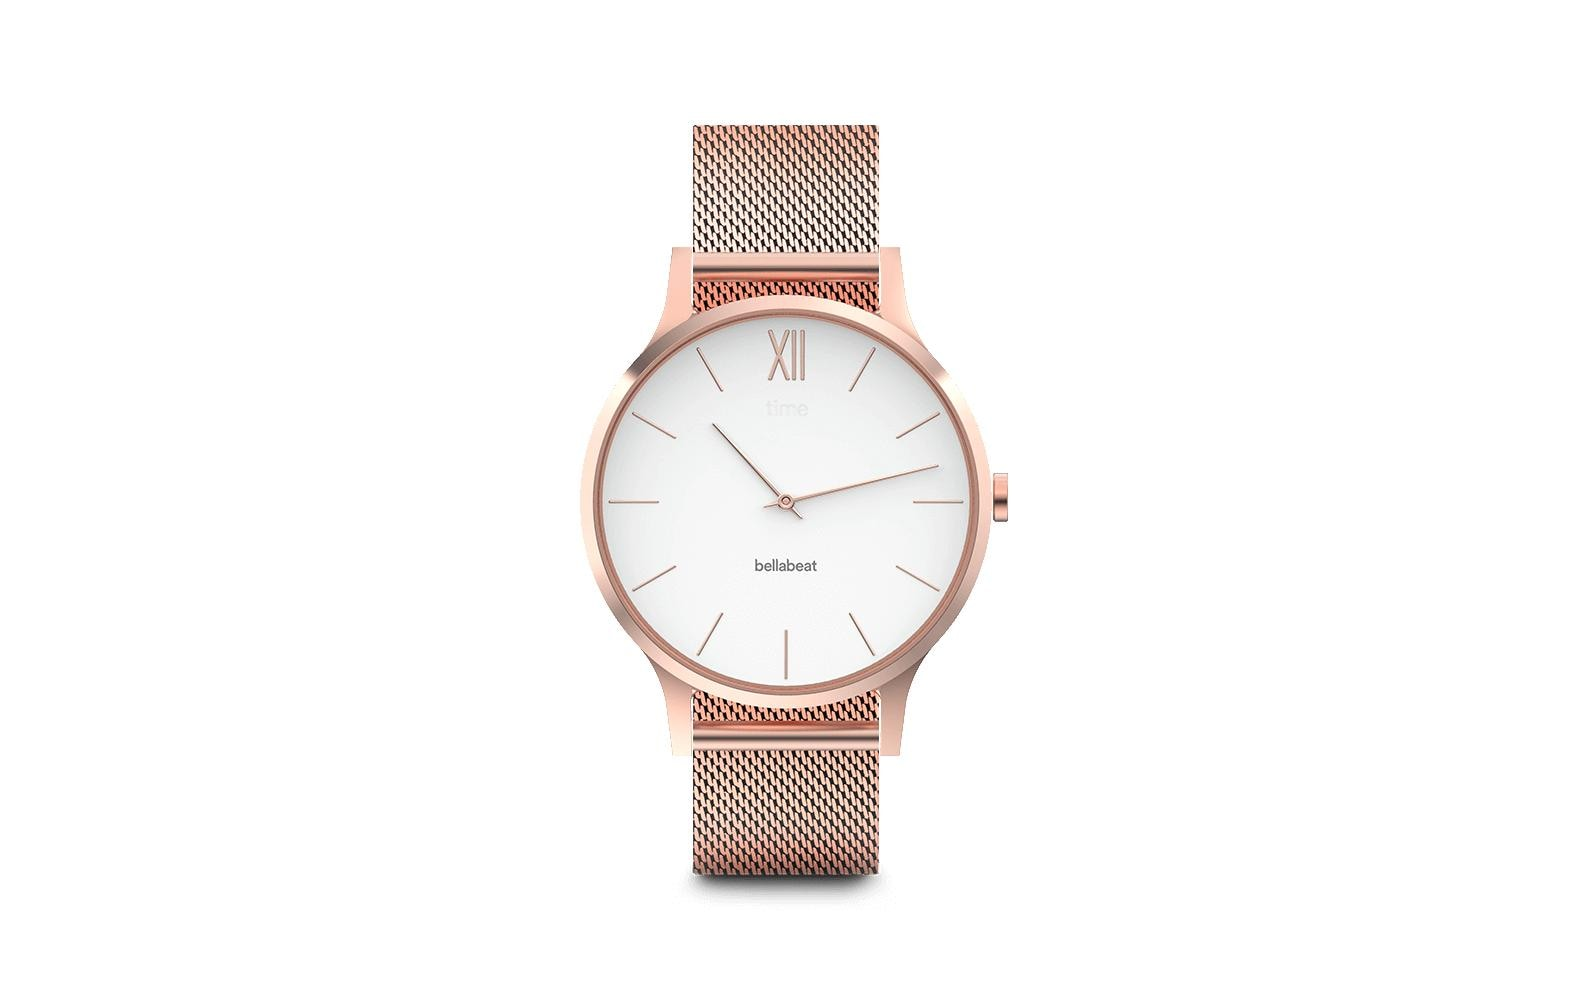 Image of Aktivitätssensor, bellabeat, »Time«